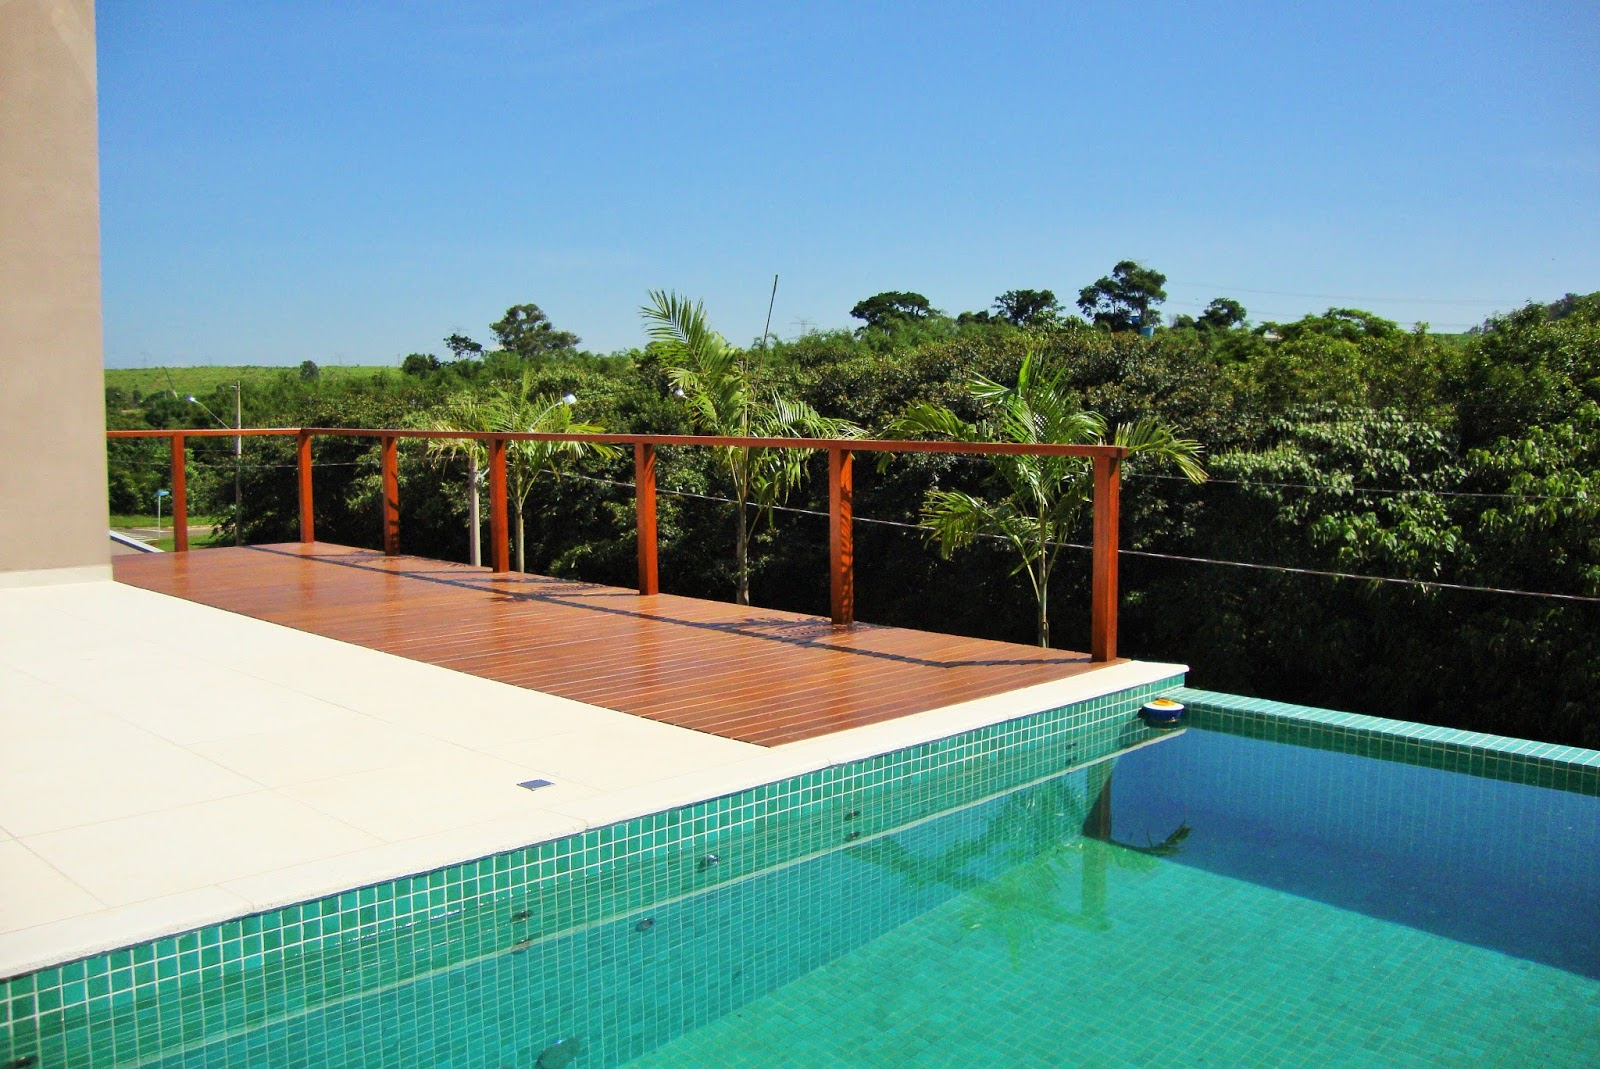 Casa alphaville dom pedro magn fica piscina com - Agua de piscina verde ...